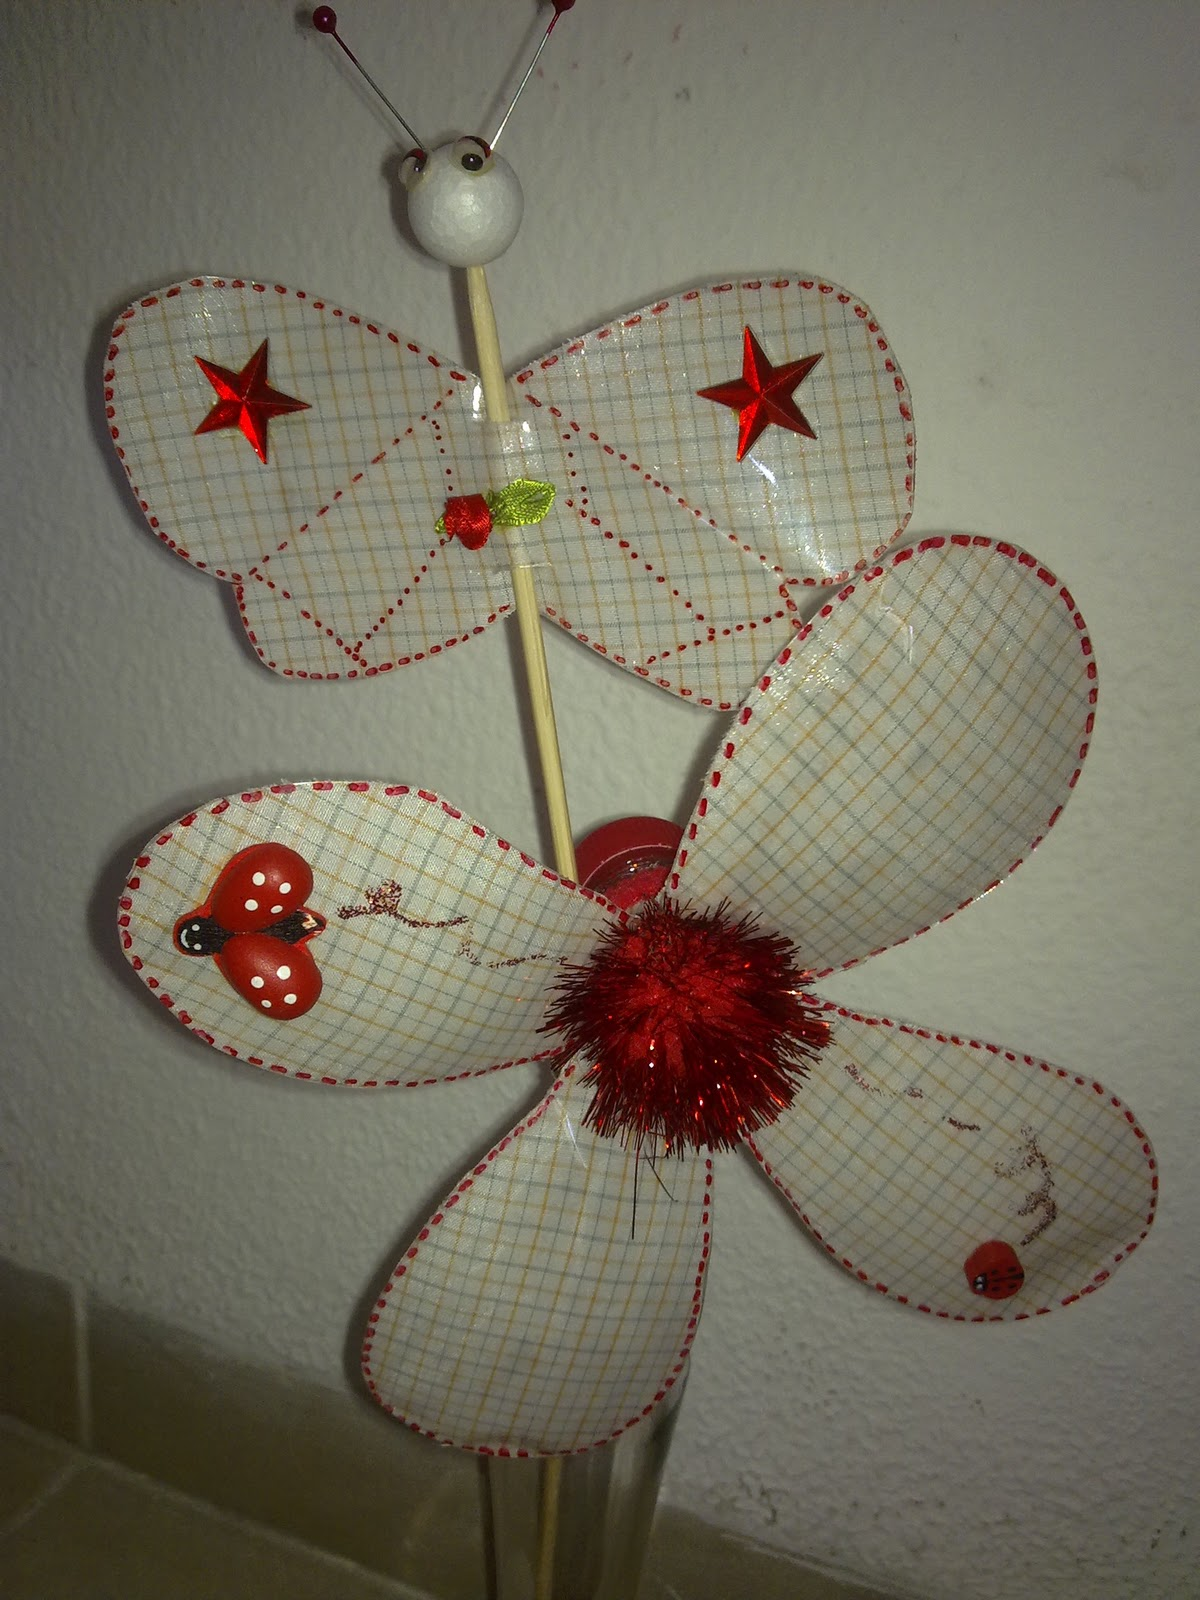 Armario Inox Magazine Luiza ~ Arte em miçangas Flor de garrafa pet no programa